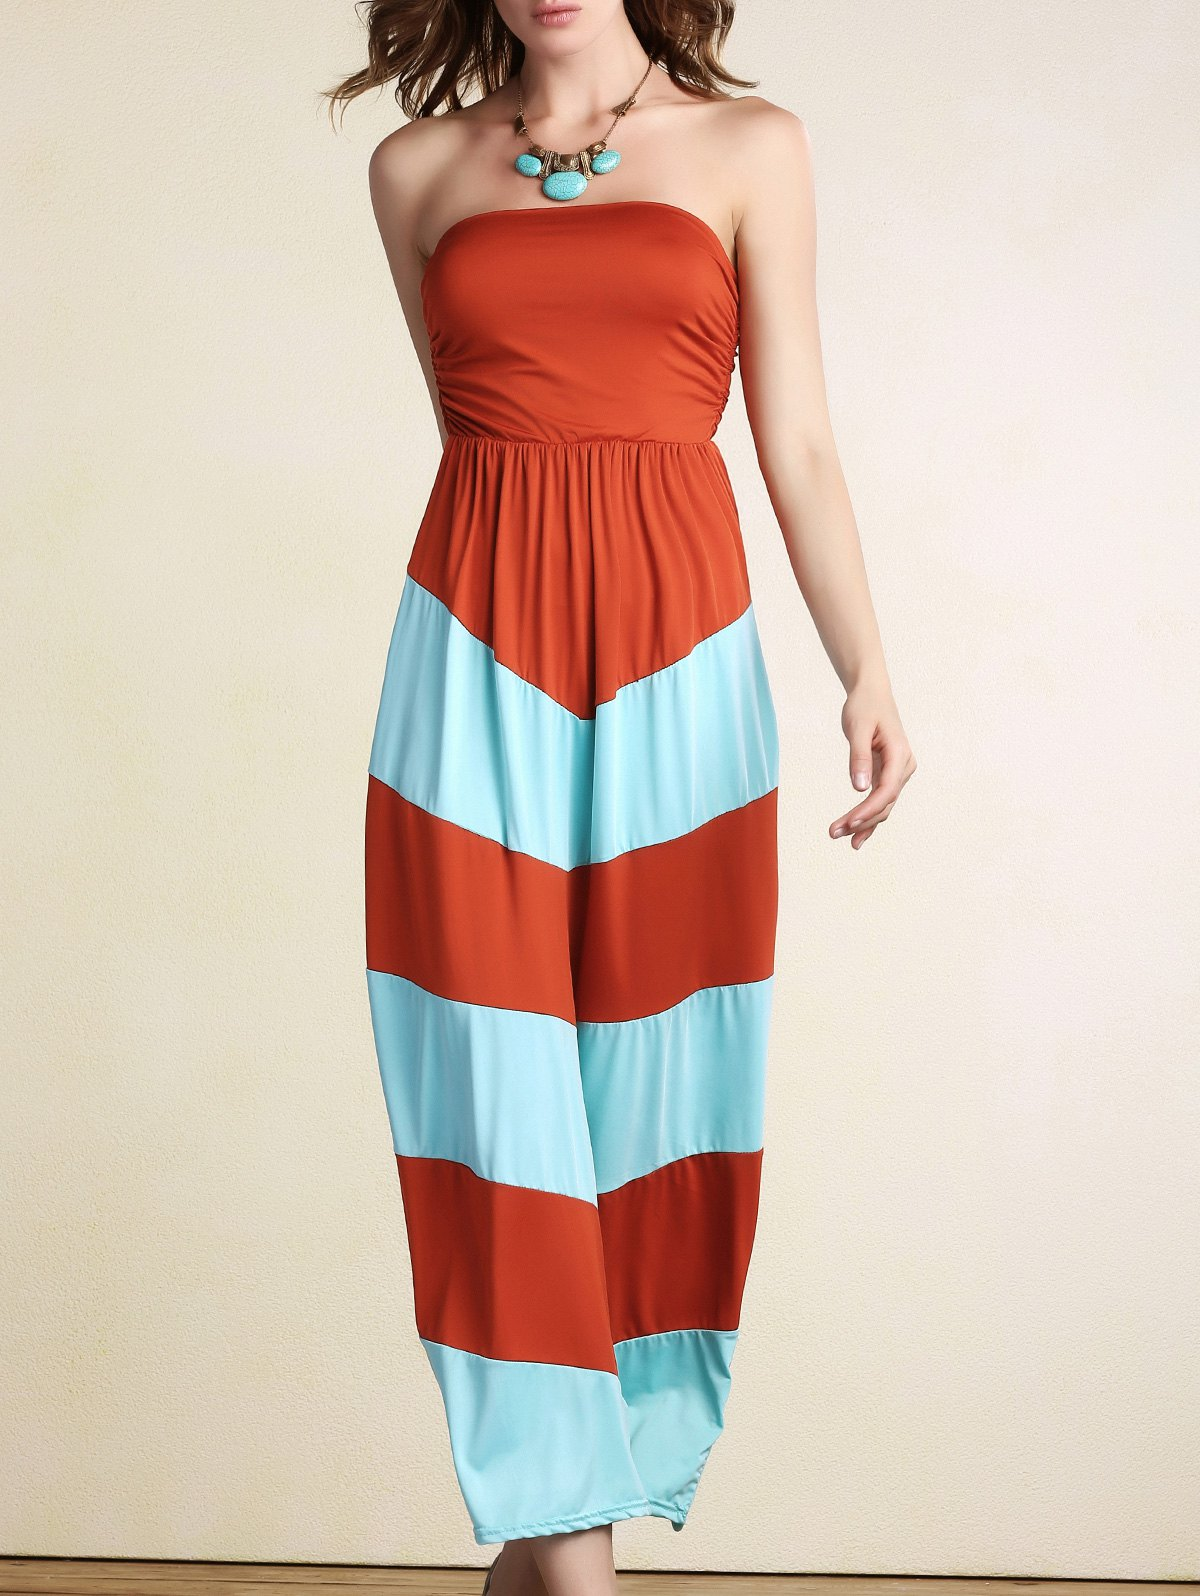 Stripe Strapless Color Block Maxi DressClothes<br><br><br>Size: S<br>Color: ORANGE